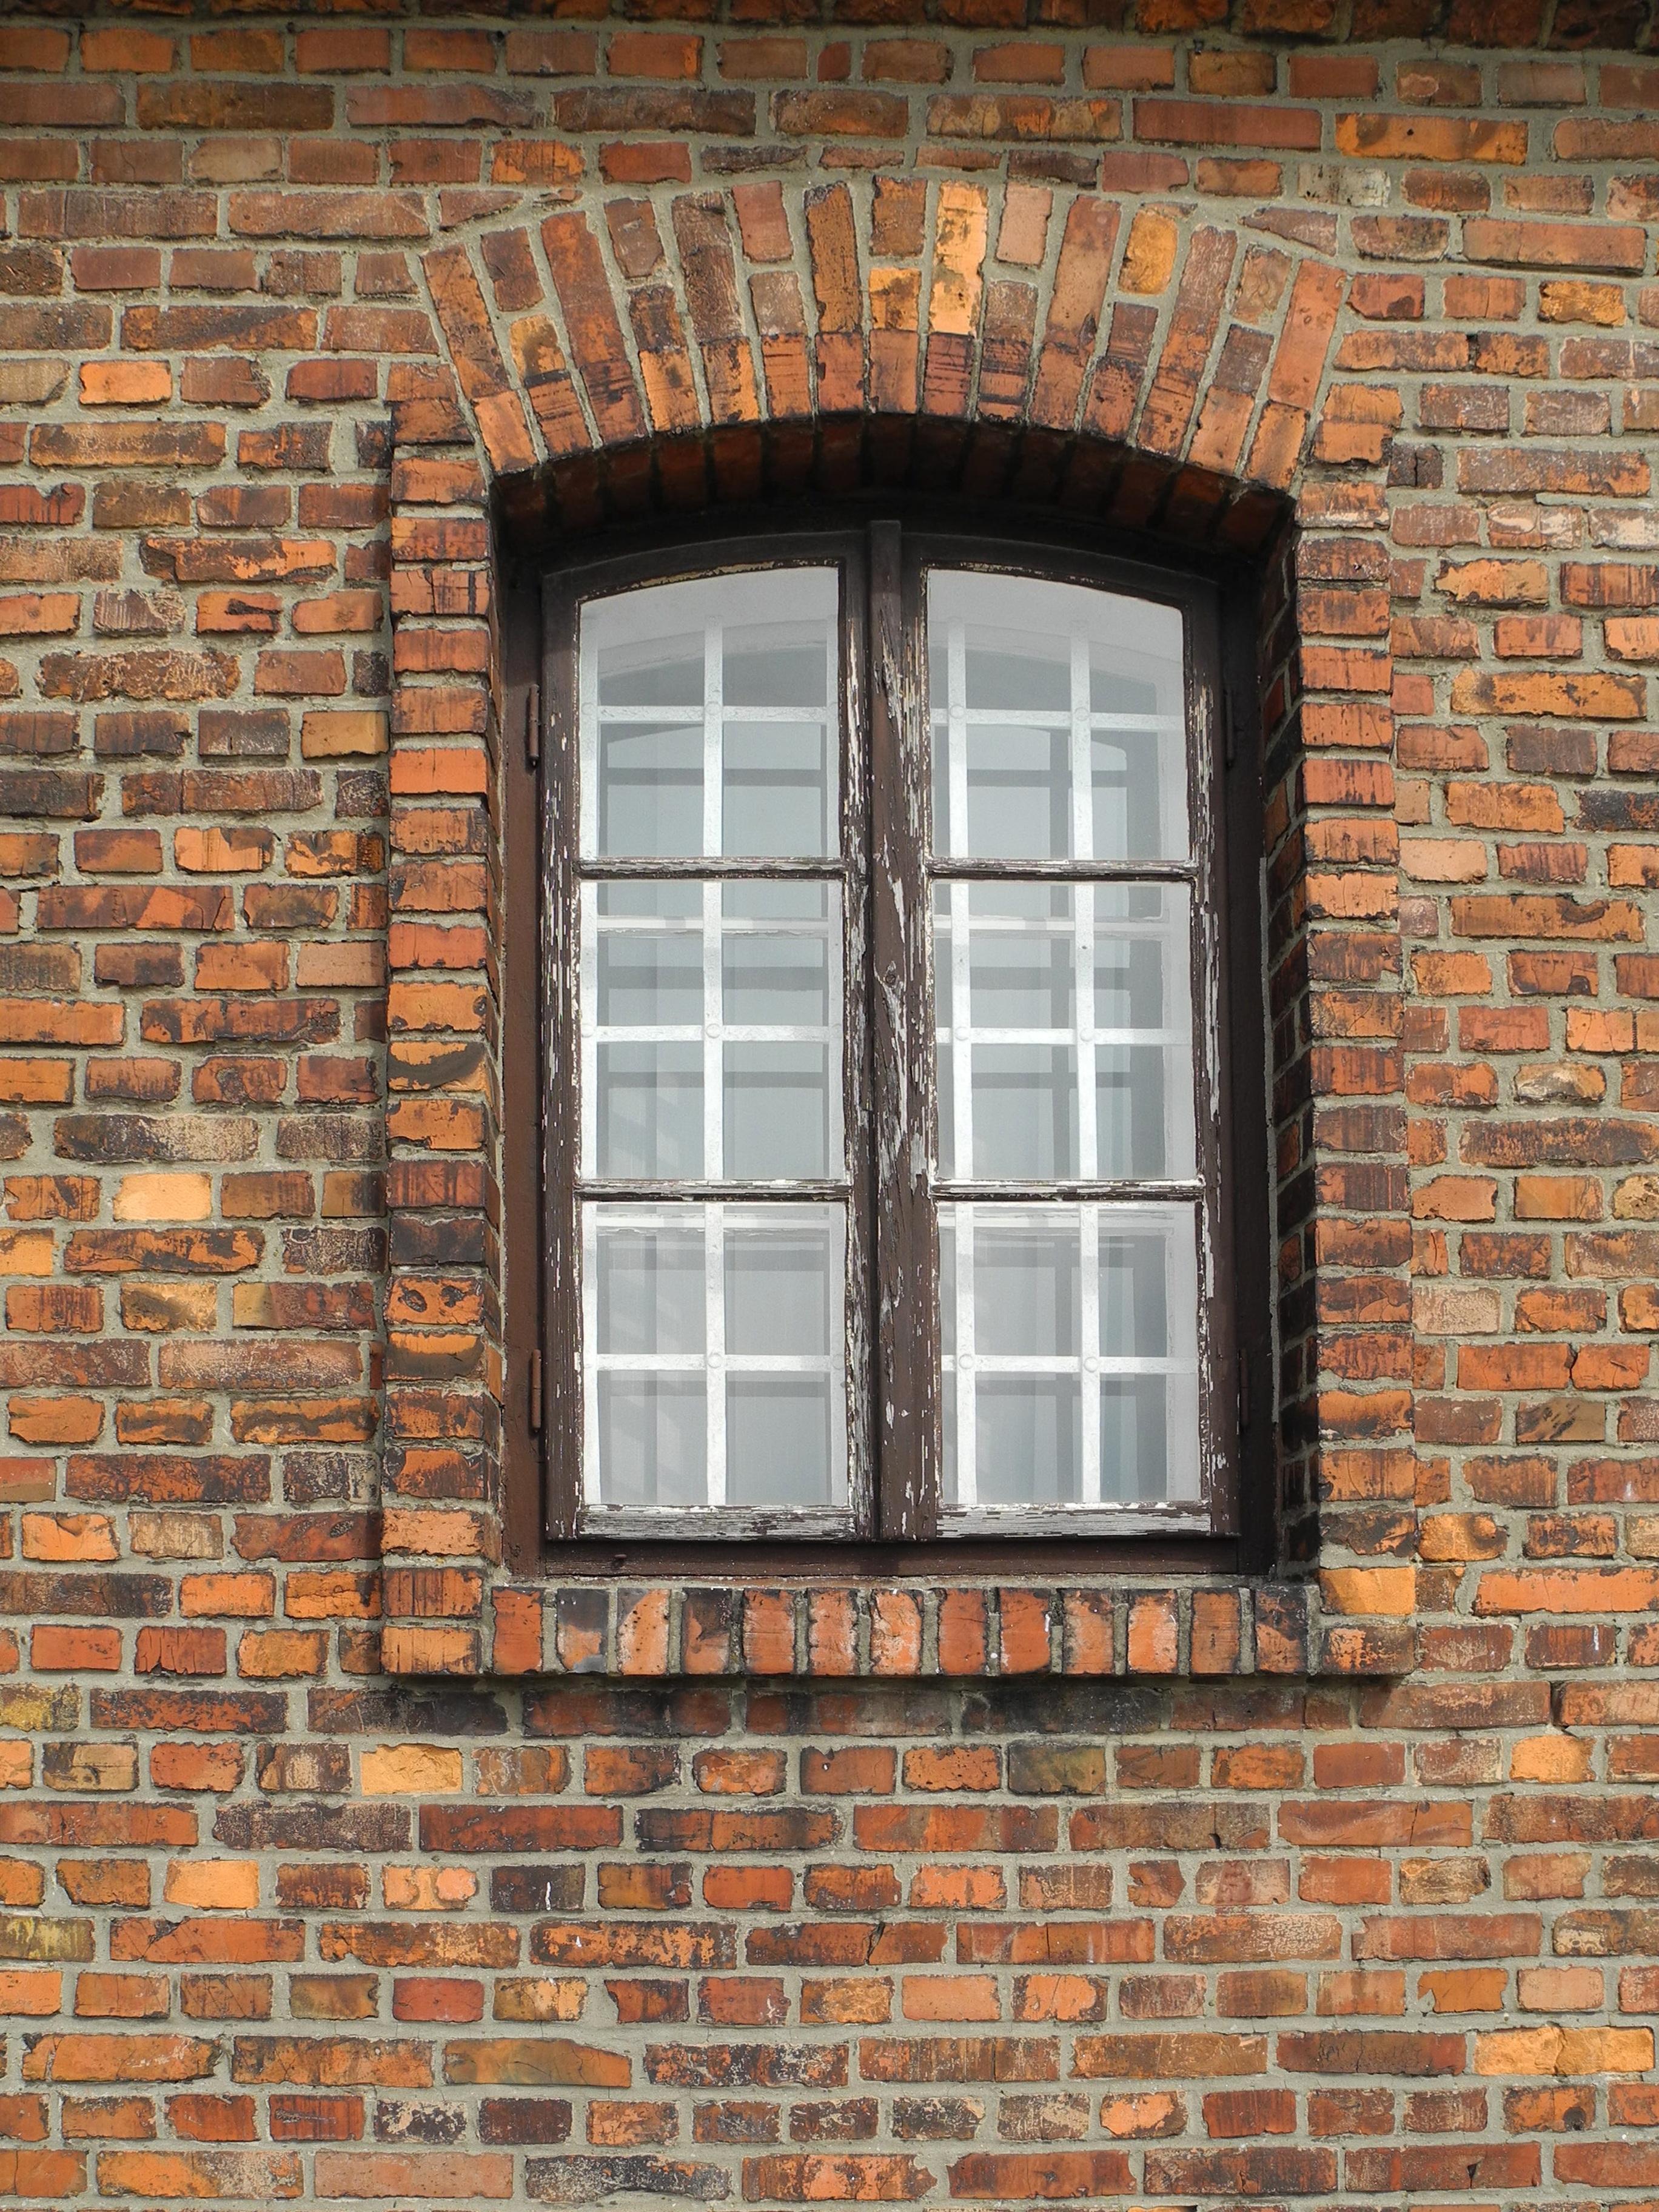 Wood Window Old Wall Facade Brick Material Interior Design Brickwork Dachau  Krakow Concentration Camp Sash Window